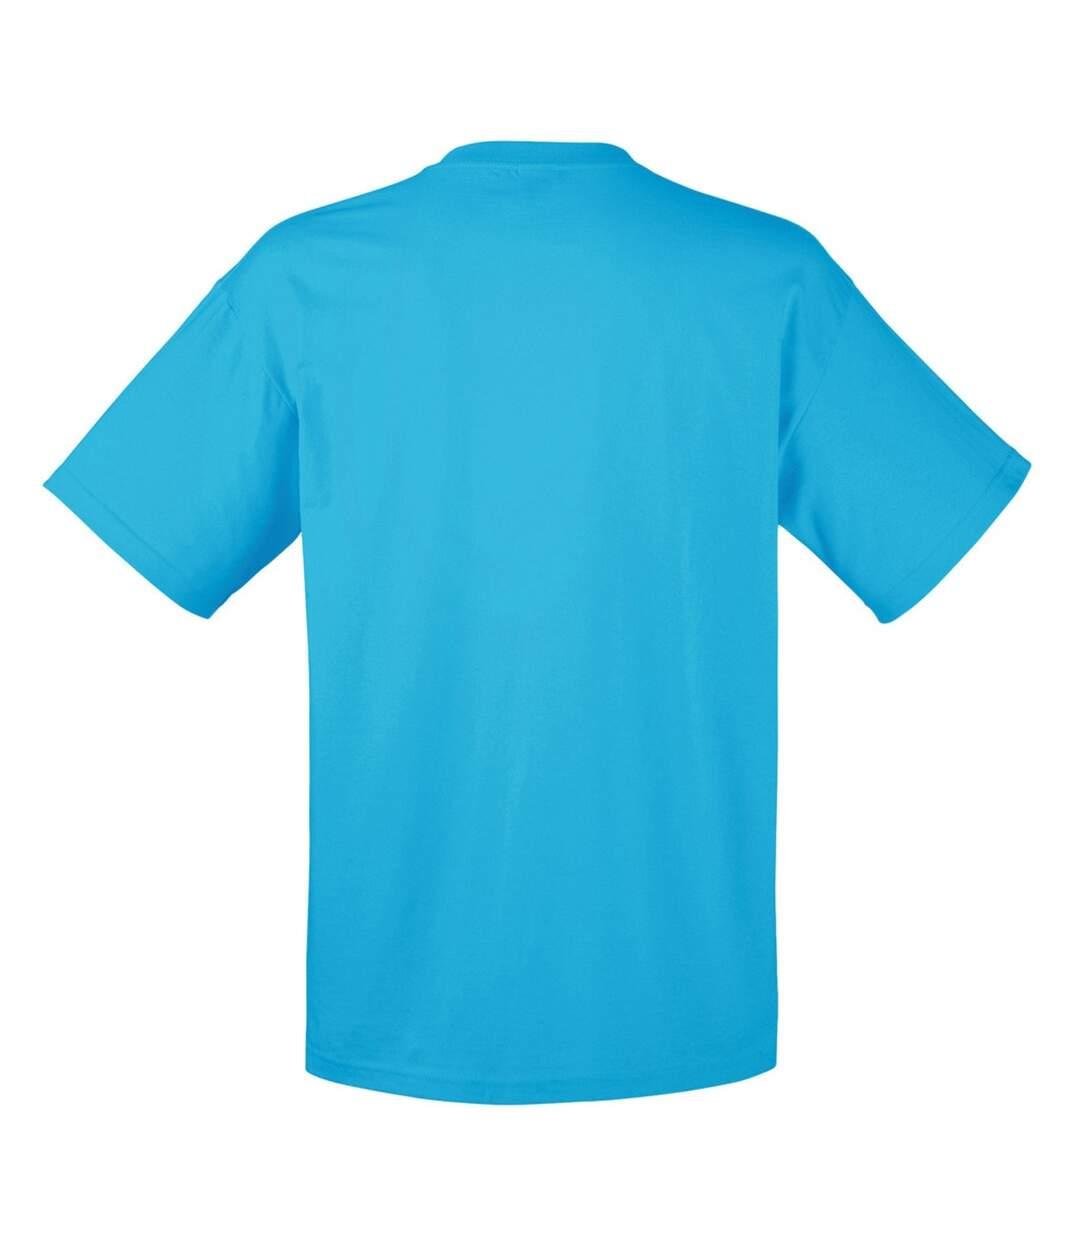 Fruit Of The Loom Mens Valueweight Short Sleeve T-Shirt (Azure Blue) - UTBC330